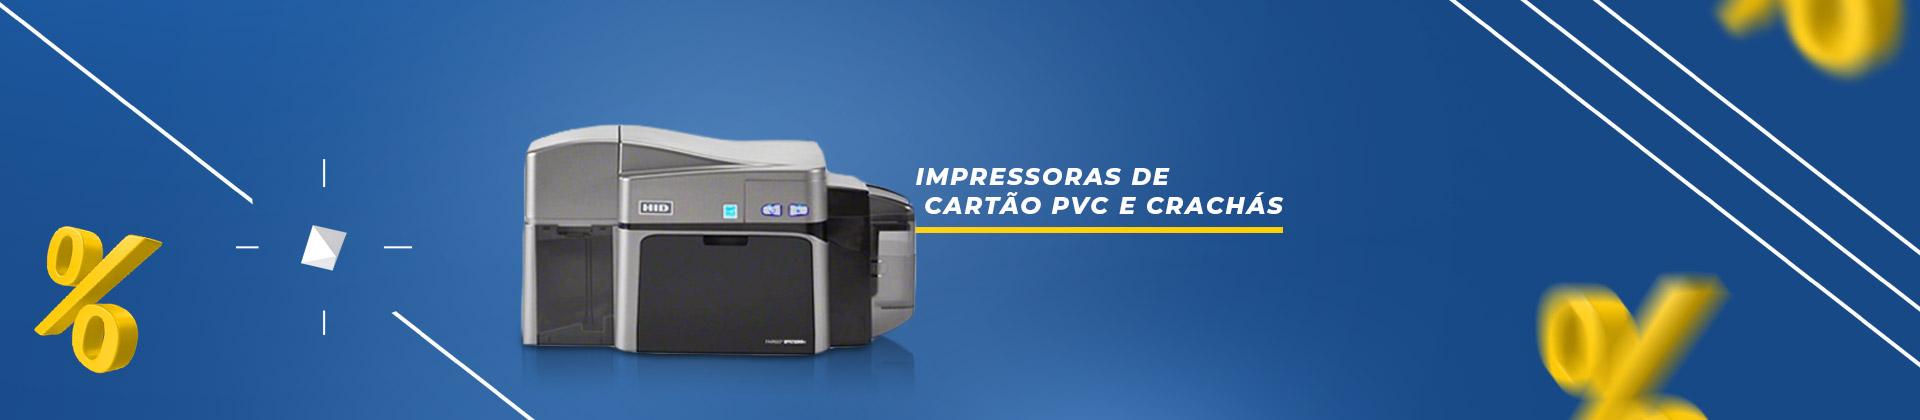 banner-03-Impressoras-de-Cartao-Pvc-e-Crachas